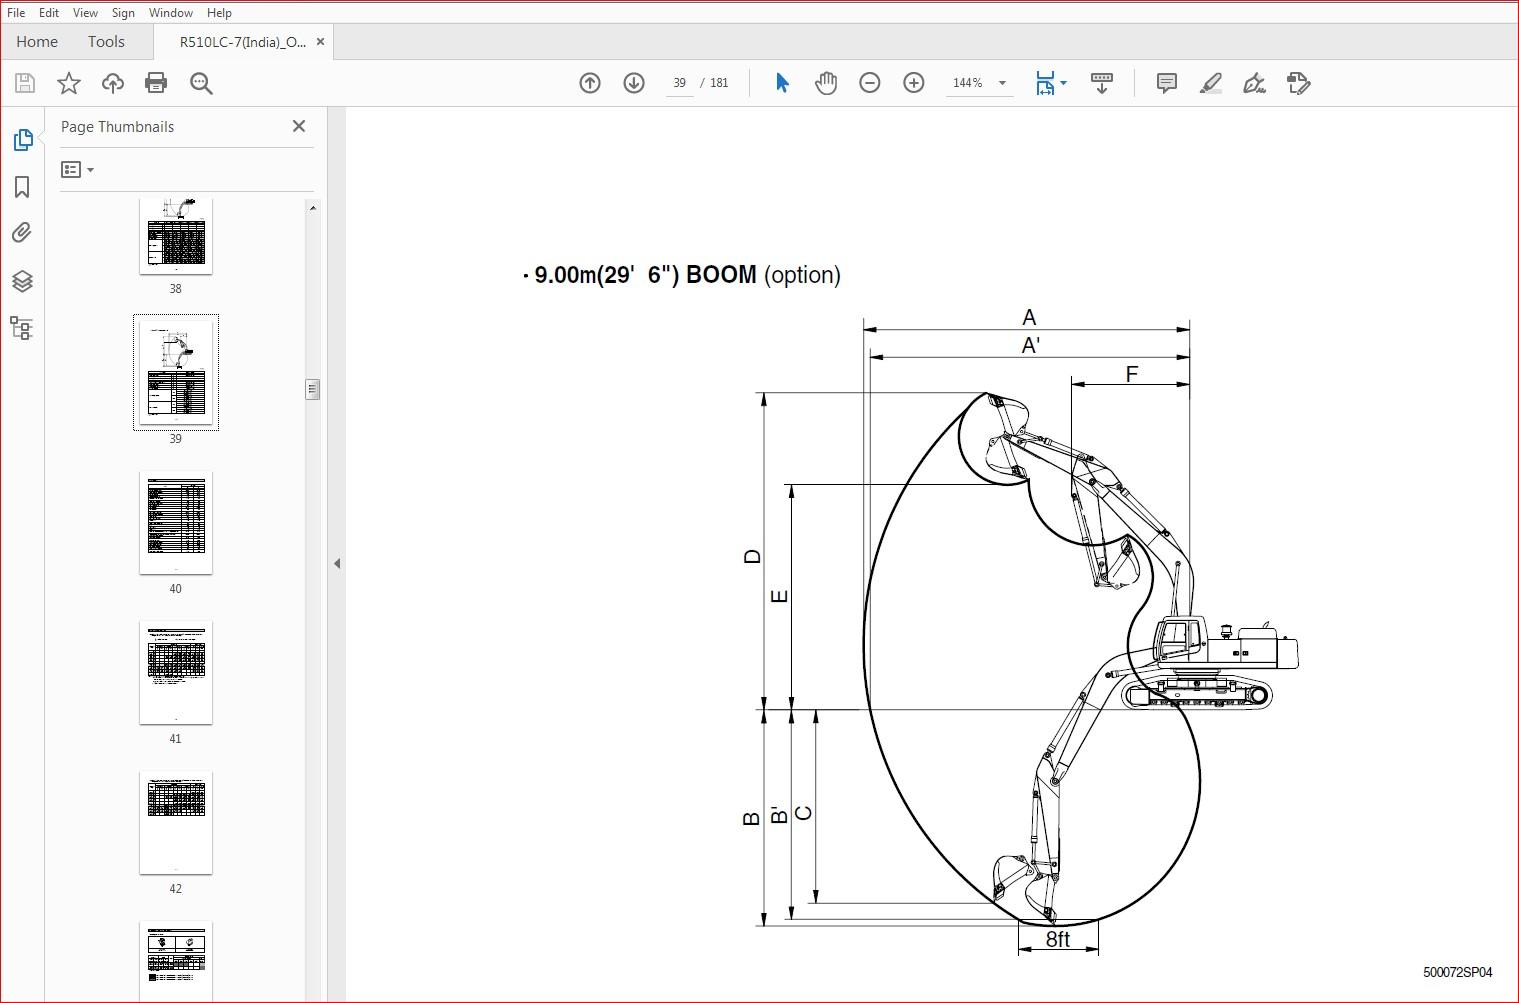 Hyundai R510LC-7 INDIA Crawler Excavator Operators Manual